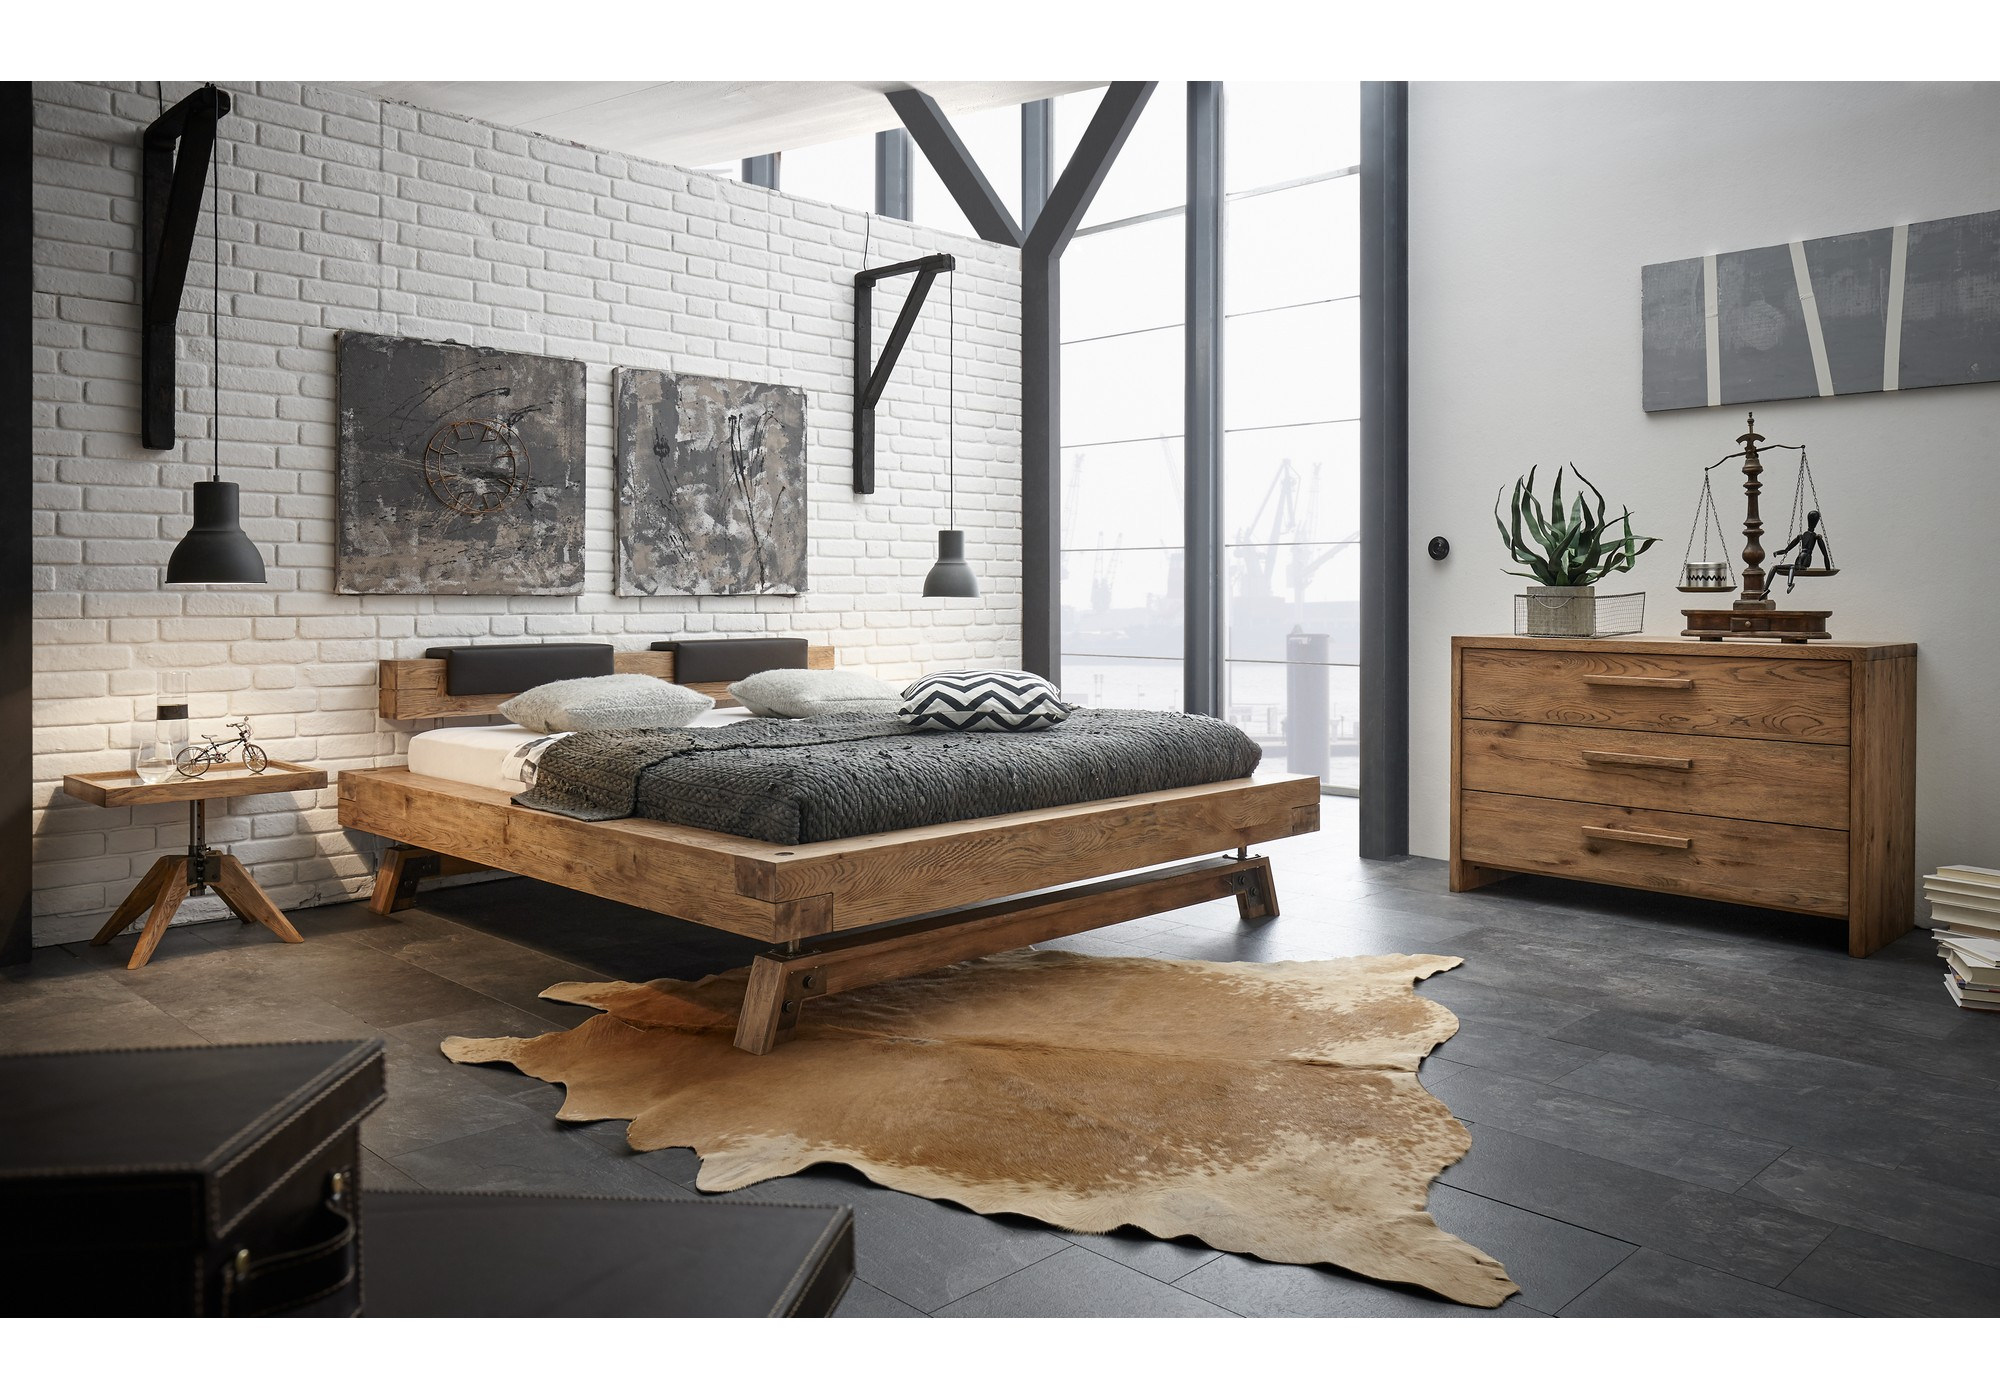 Full Size of Massivholz Betten Hasena Oak Wildeiche Massivholzbetten Kraft Breckle Test Günstige Mannheim Amazon Meise Schlafzimmer Komplett Bonprix Günstig Kaufen Bett Bett Massivholz Betten